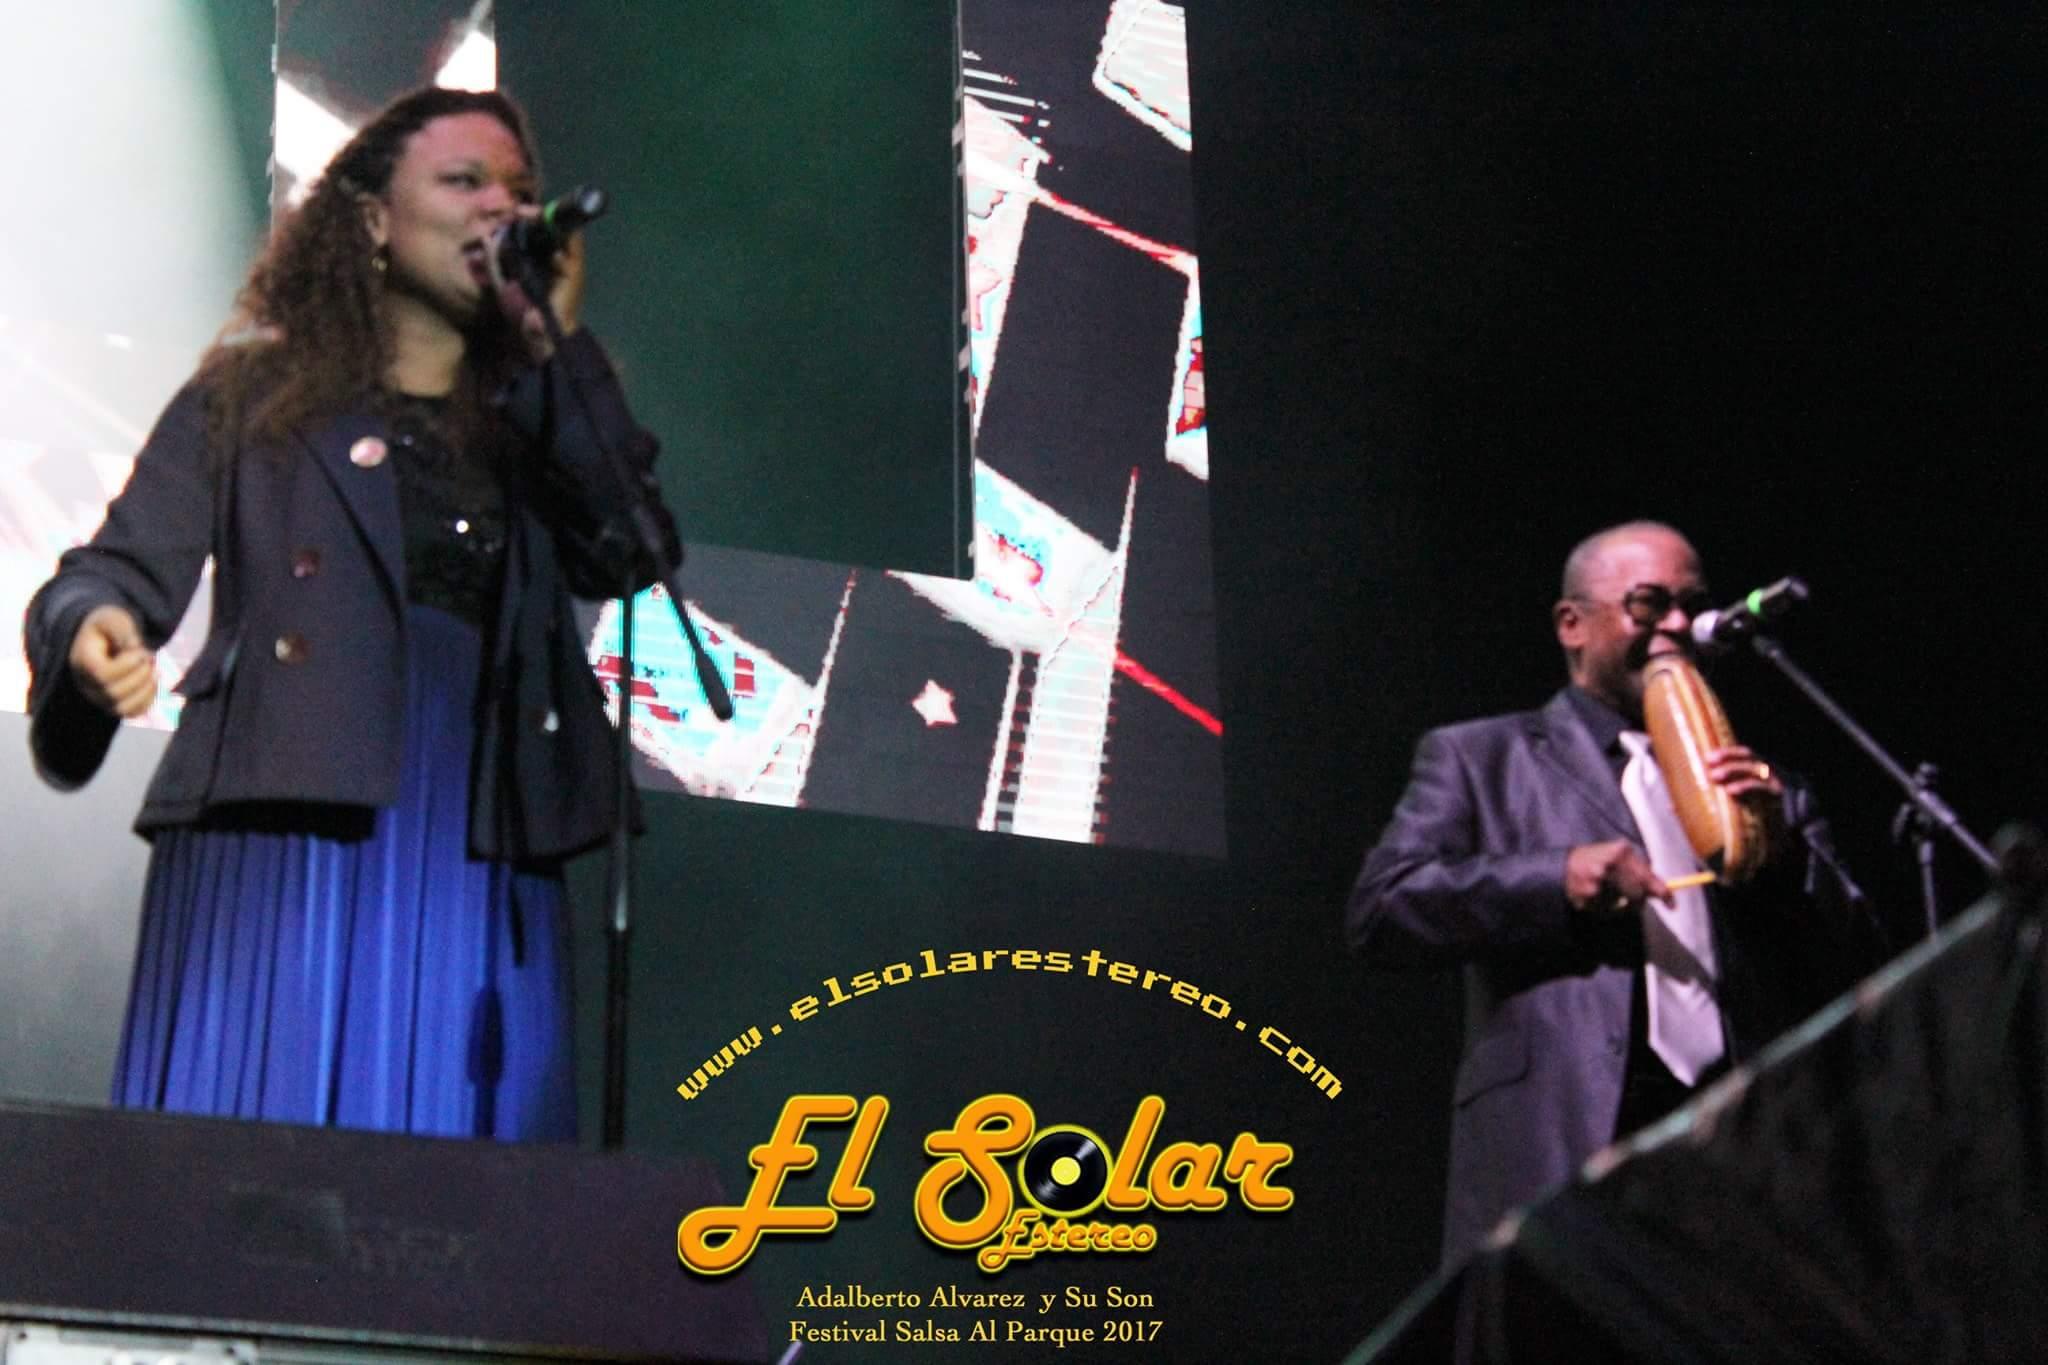 Vocalist Jennifer Alvarez during Salsa al Parque Festival presentation